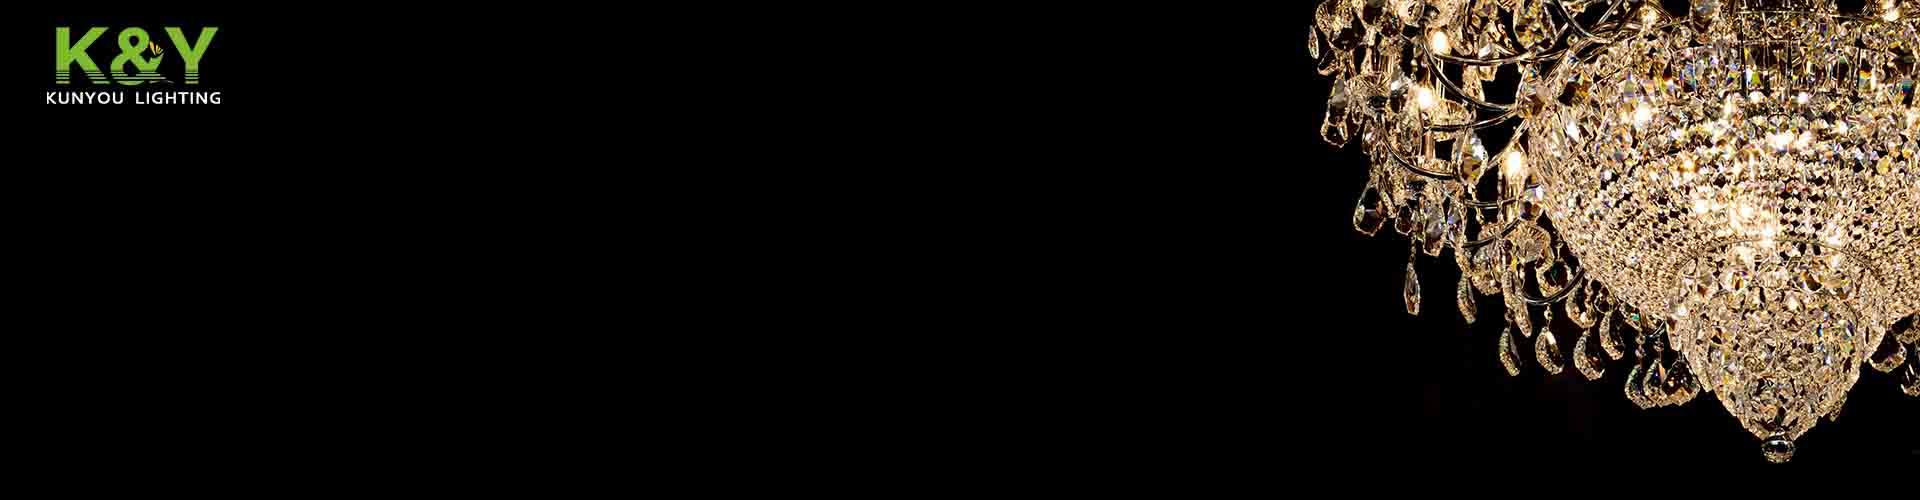 Ceiling Lamp manufacturer